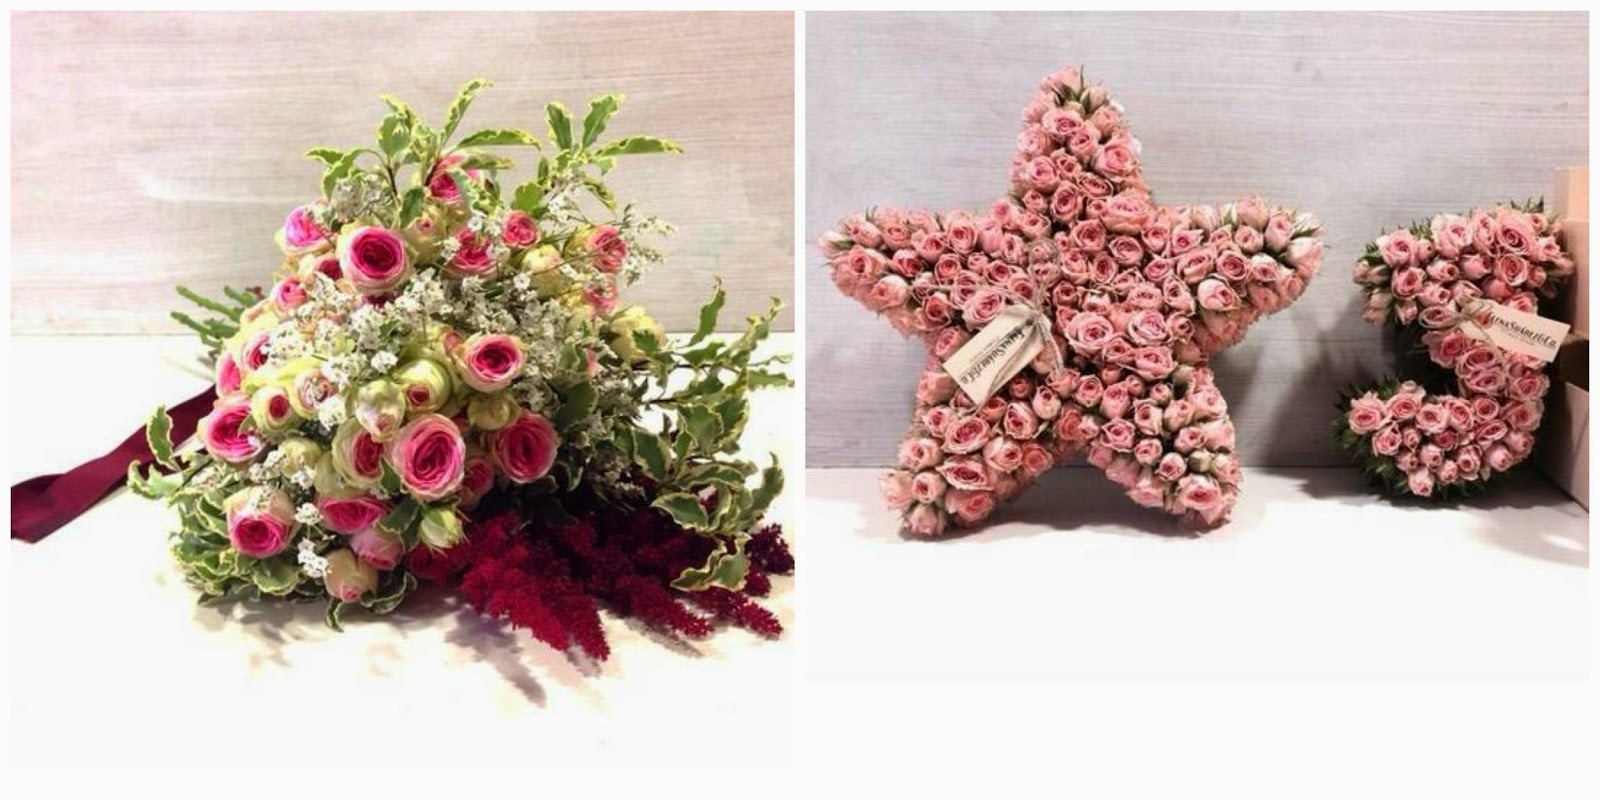 ramos de novia originales decoracion floral elena suarez & co blog bodas mi boda gratis